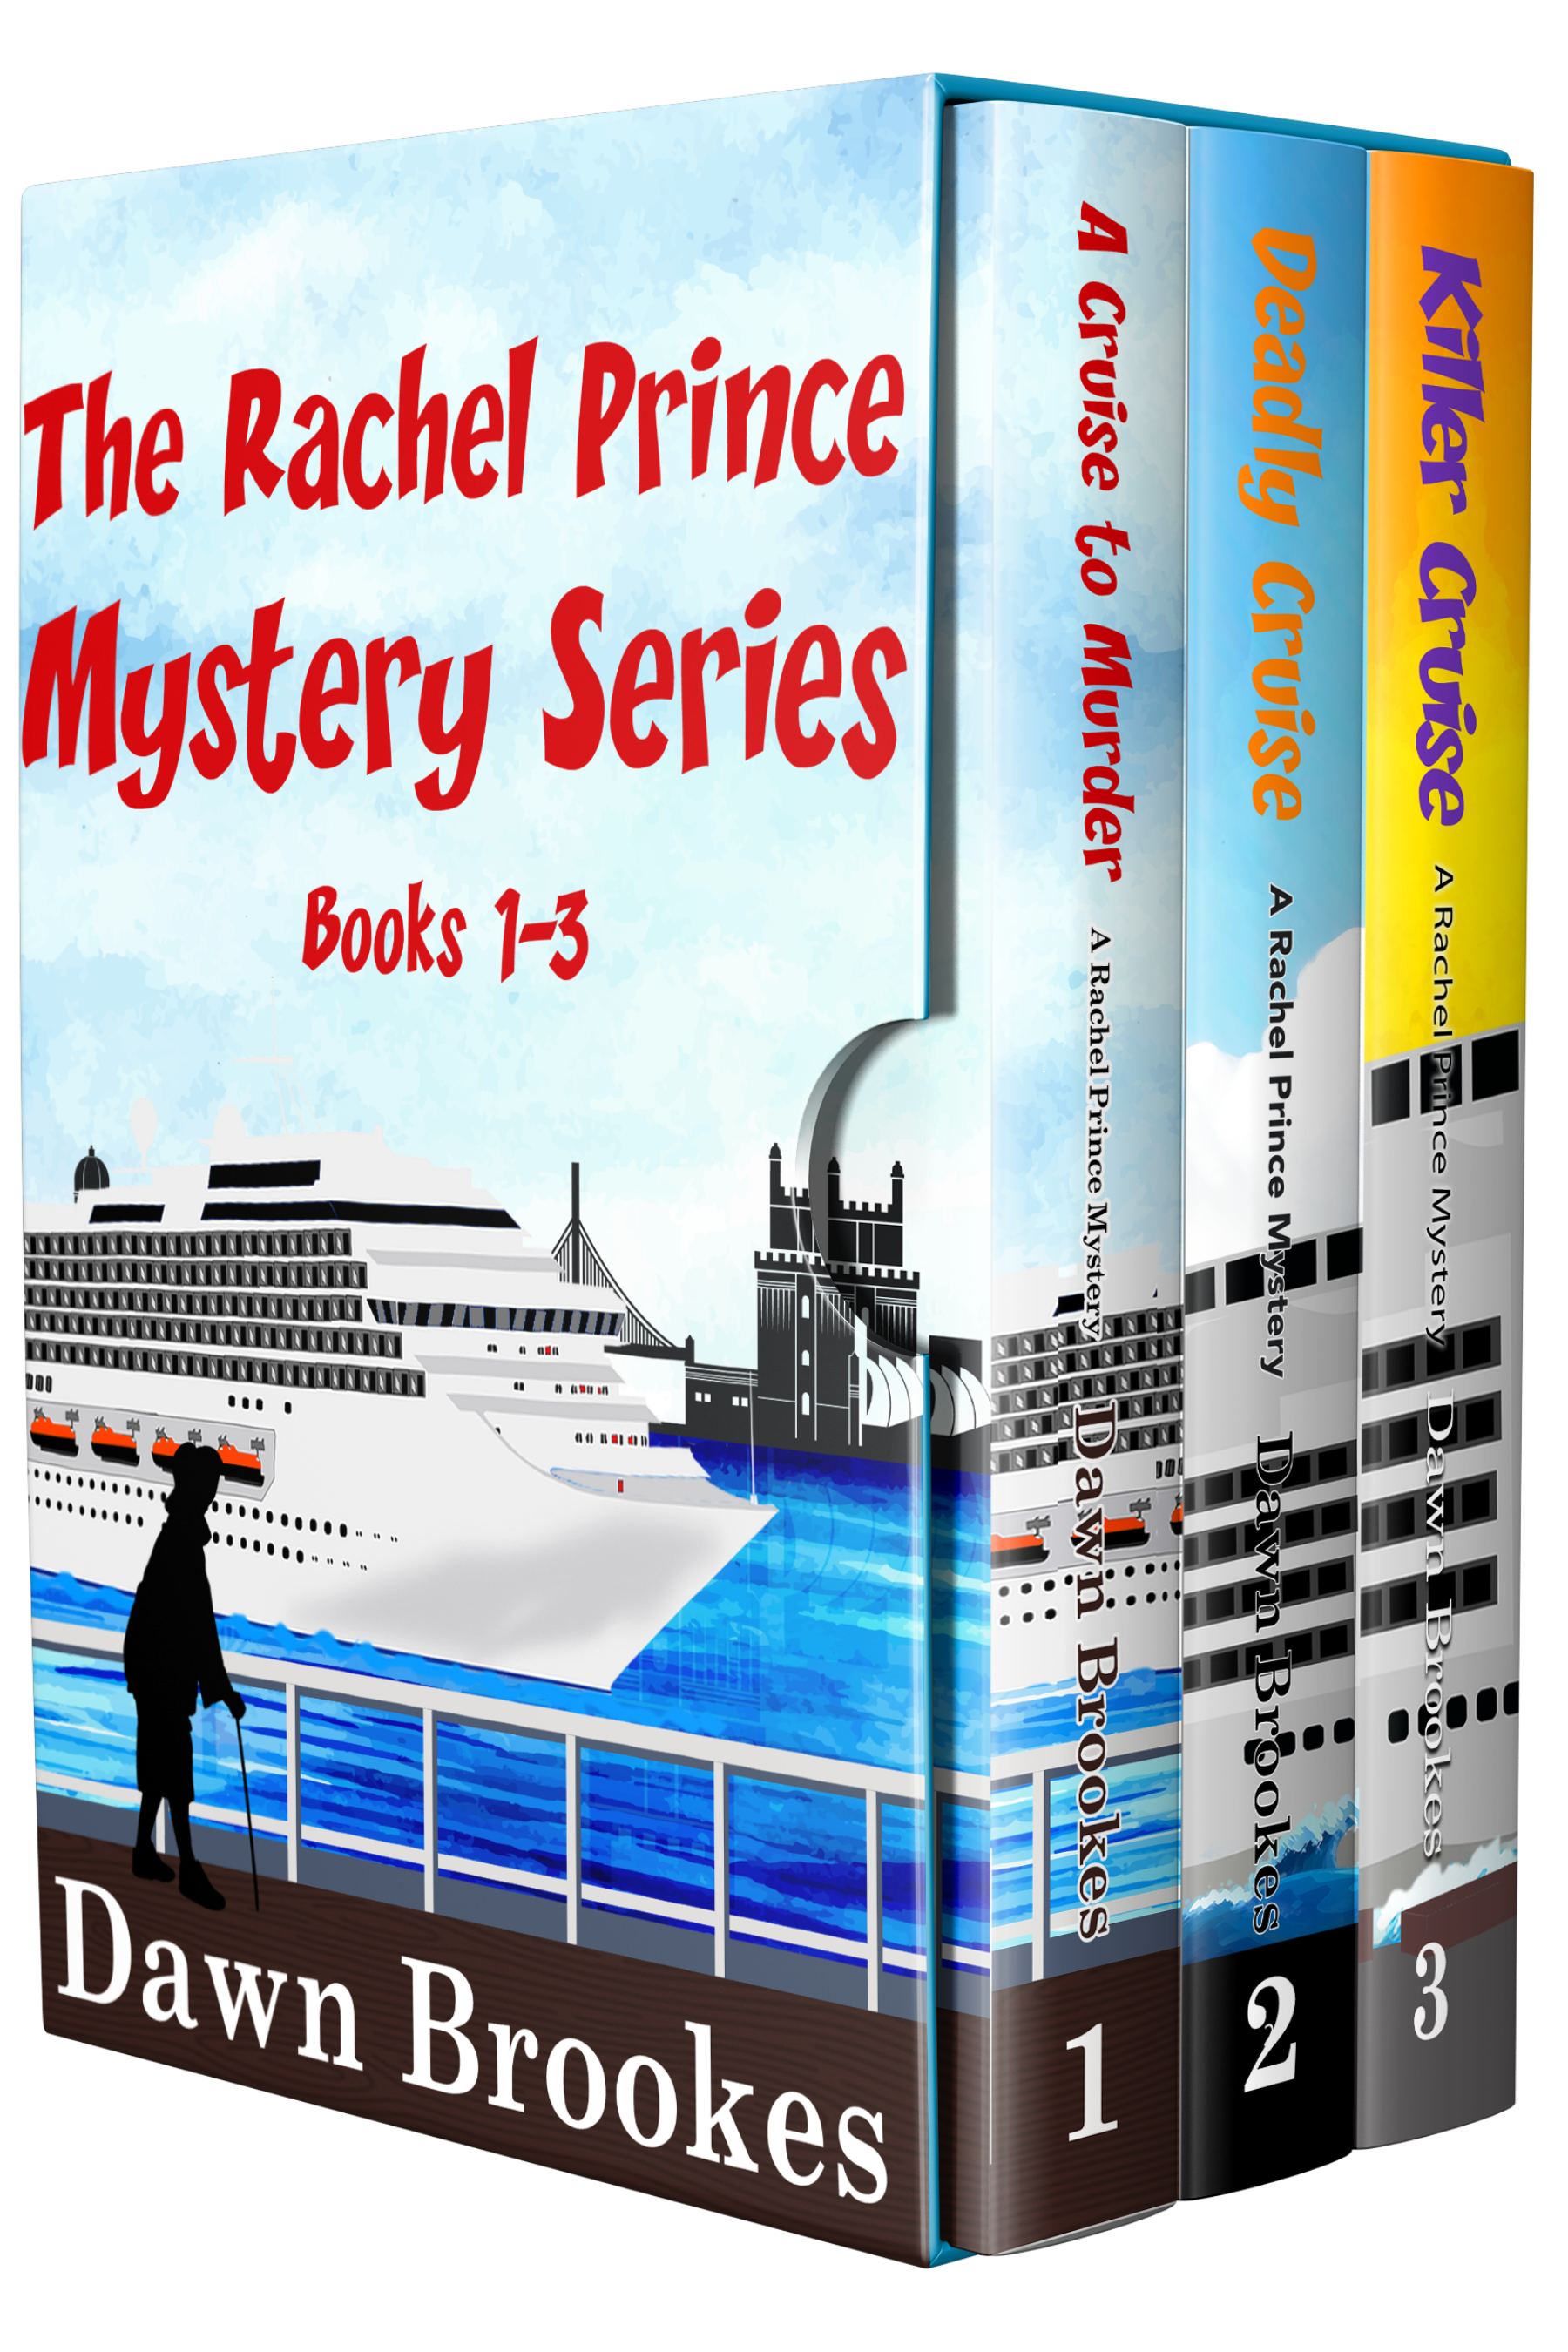 The Rachel Prince Mystery Series Books 1-3